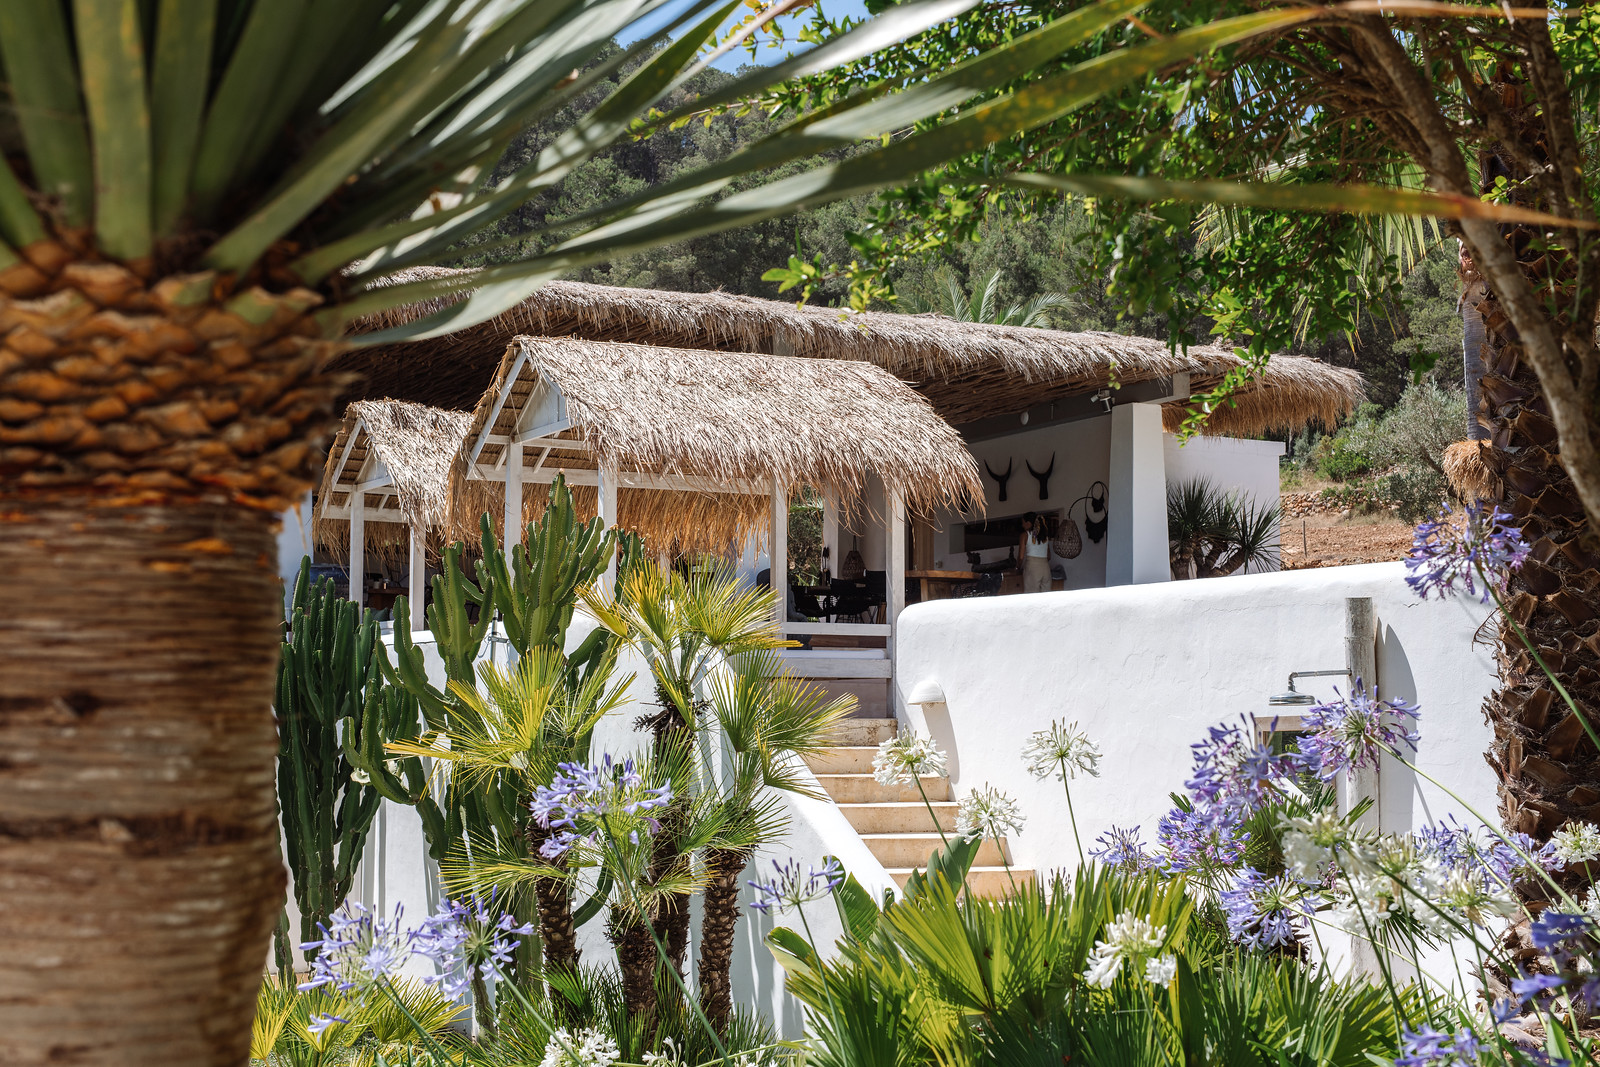 https://www.white-ibiza.com/wp-content/uploads/2020/03/ibiza-hotels-pure-house-ibiza-ana-lui-2021-14.jpg